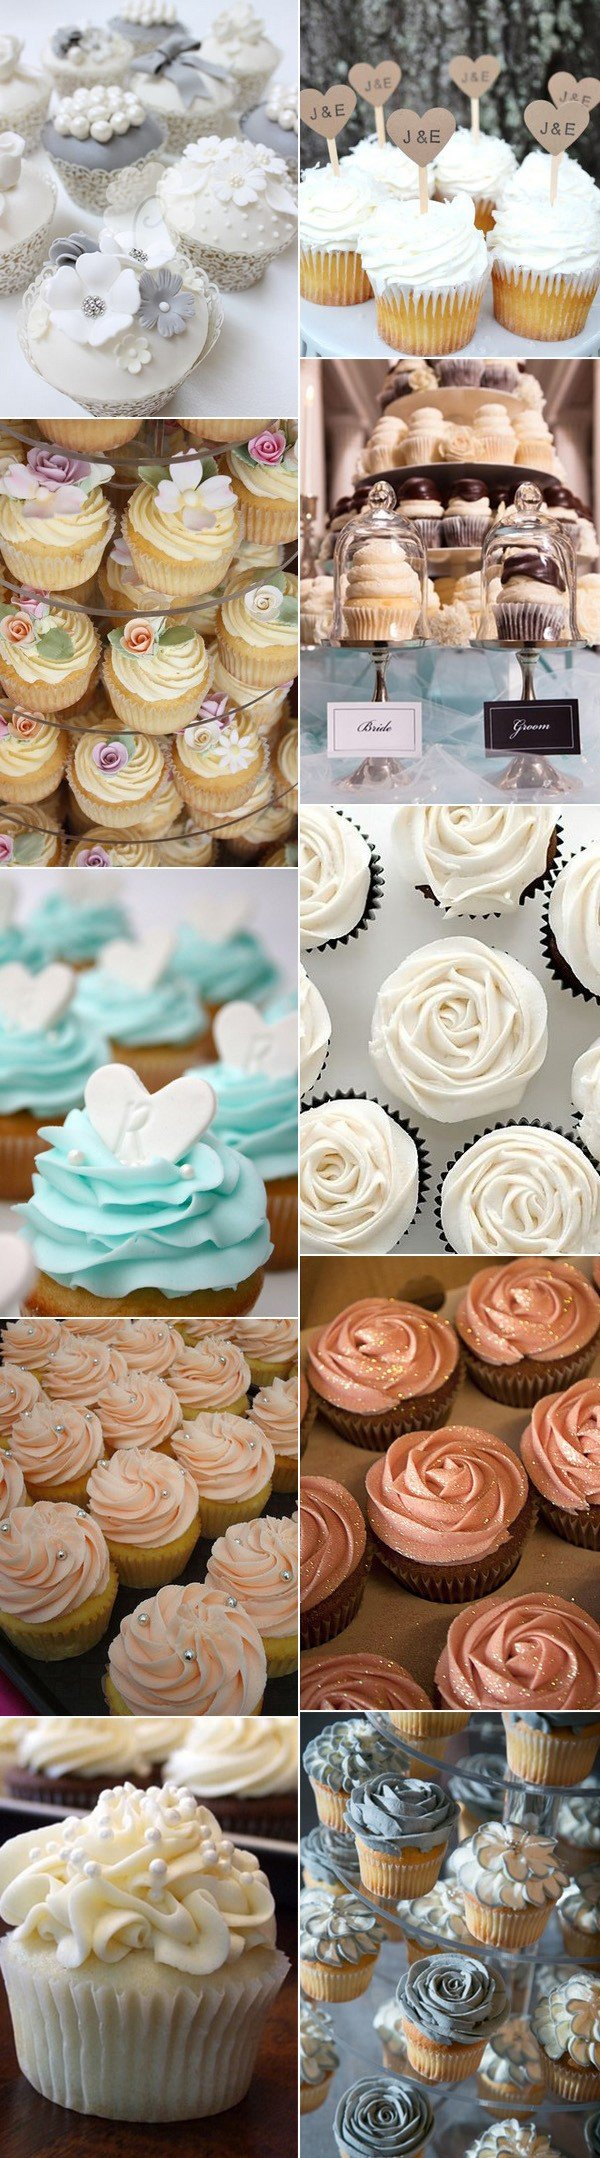 unique wedding cupcake ideas